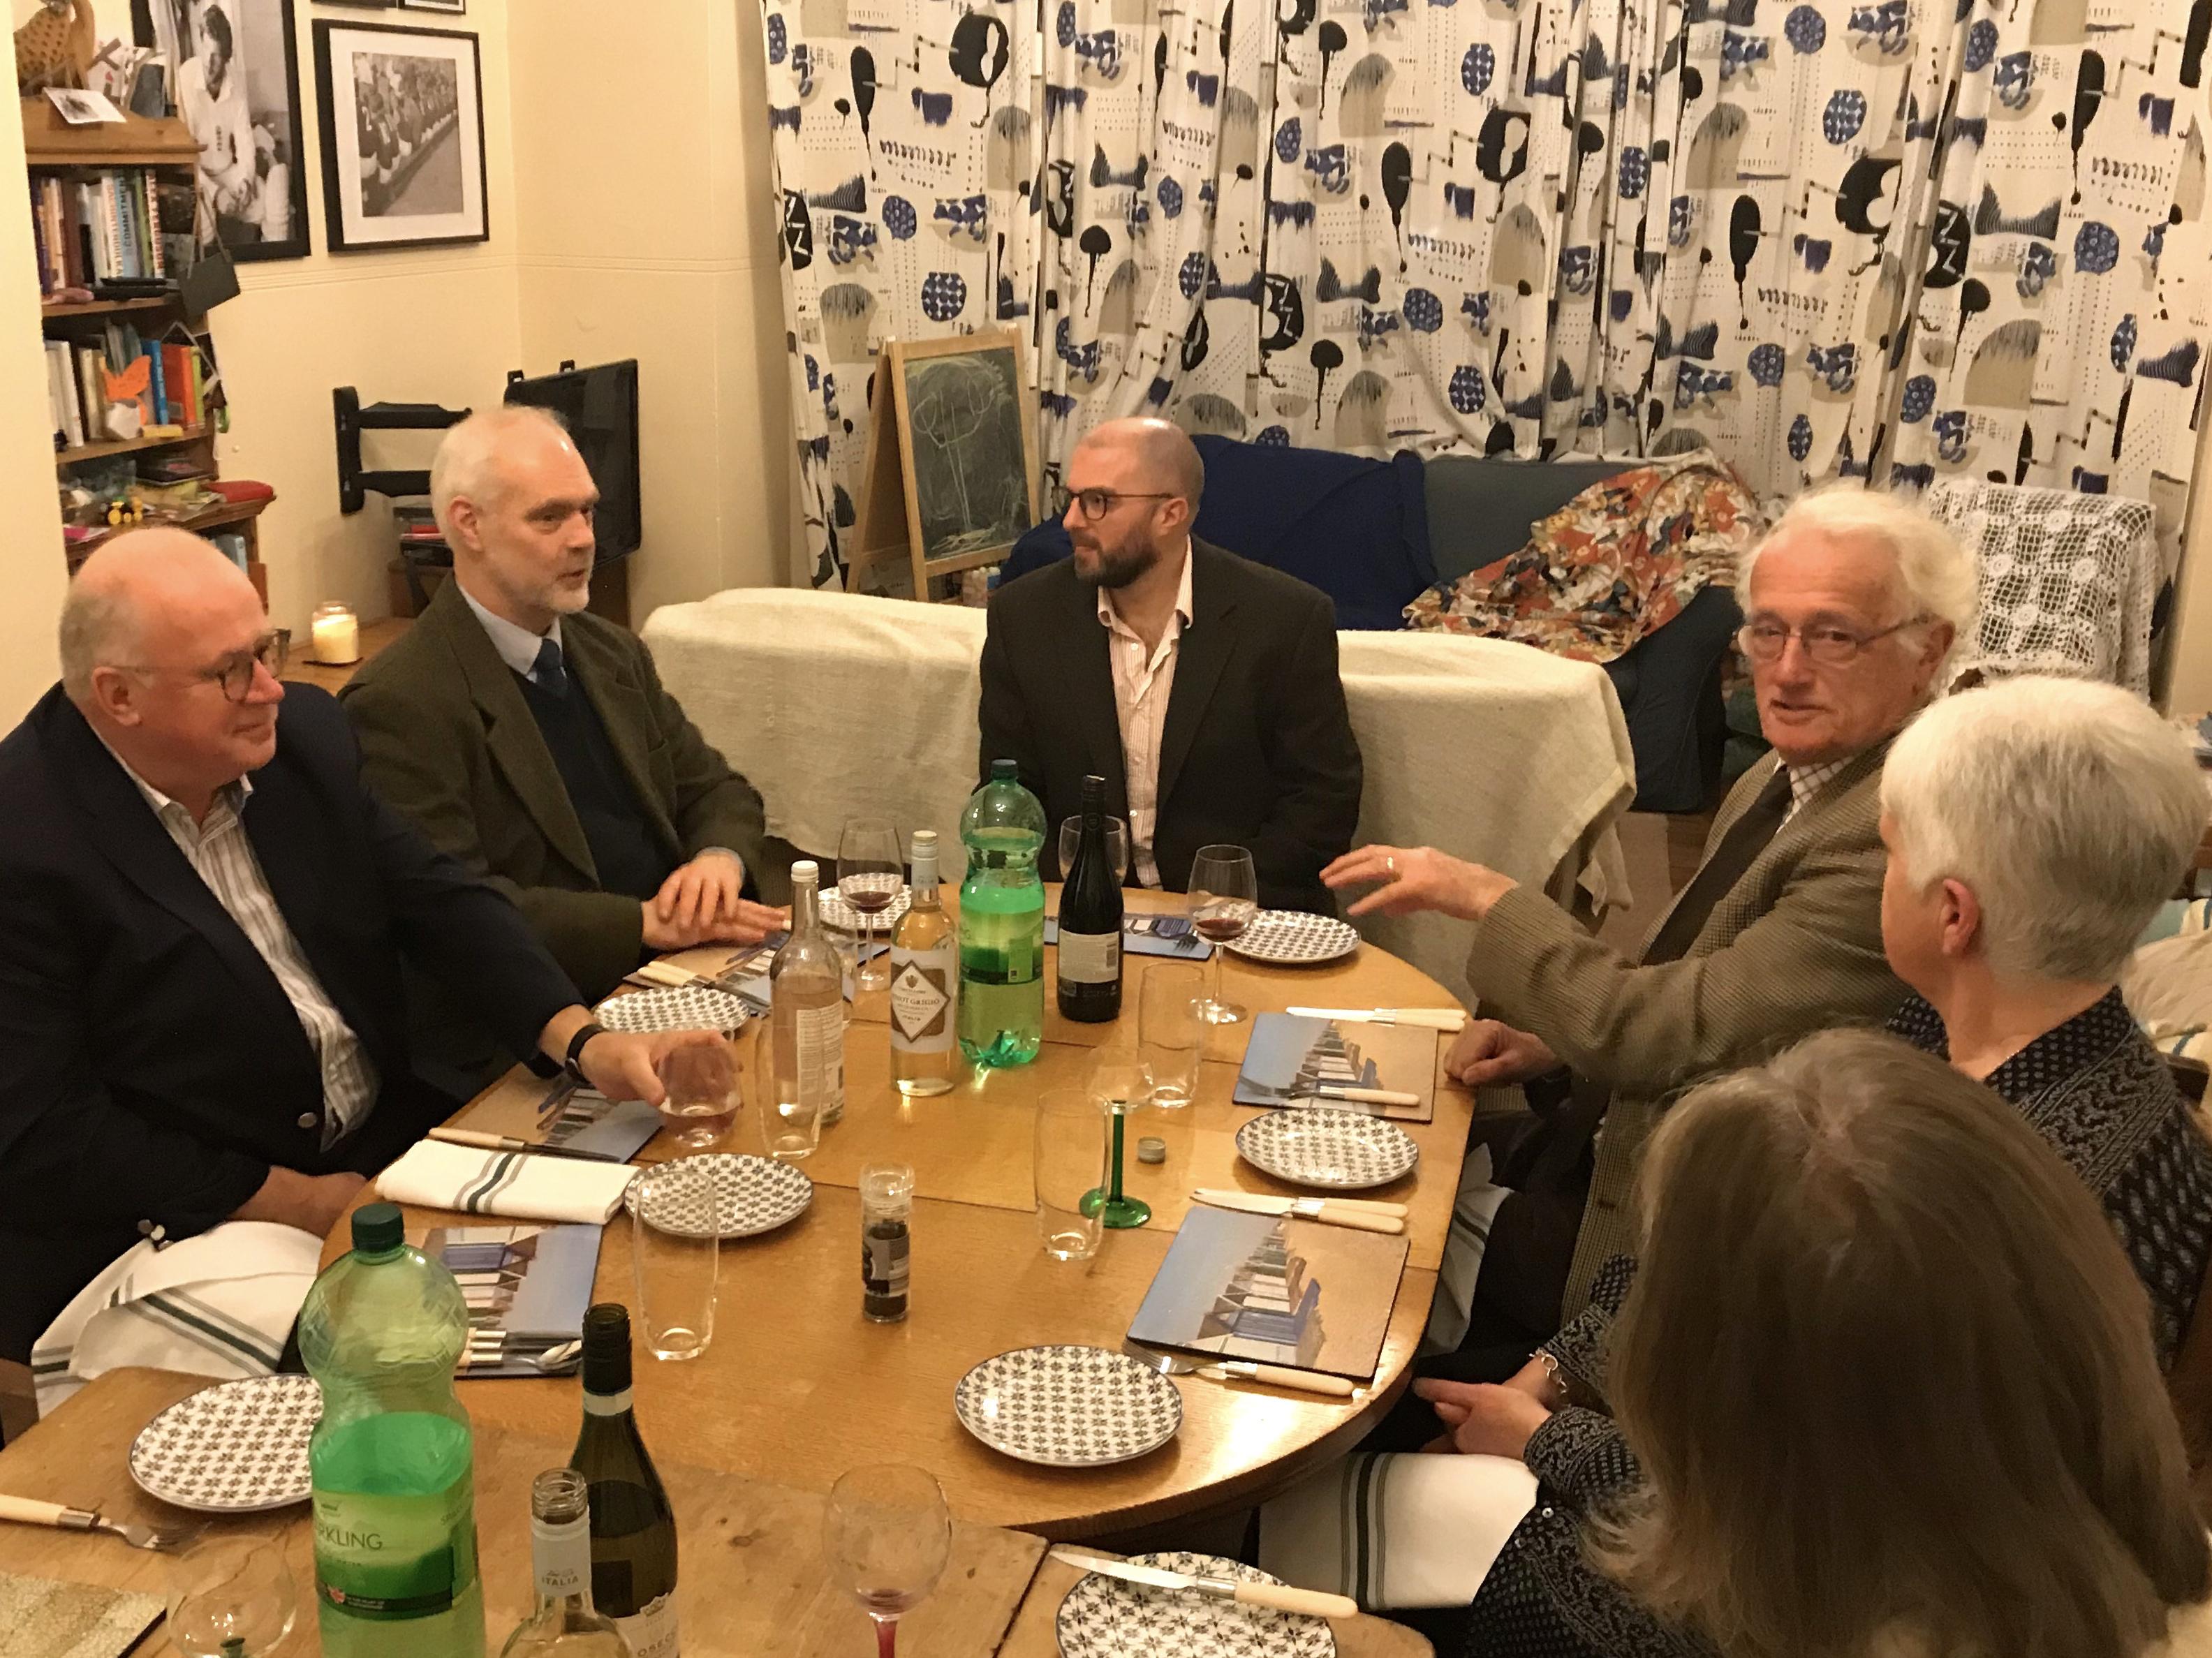 Bradford Houseparents reunion